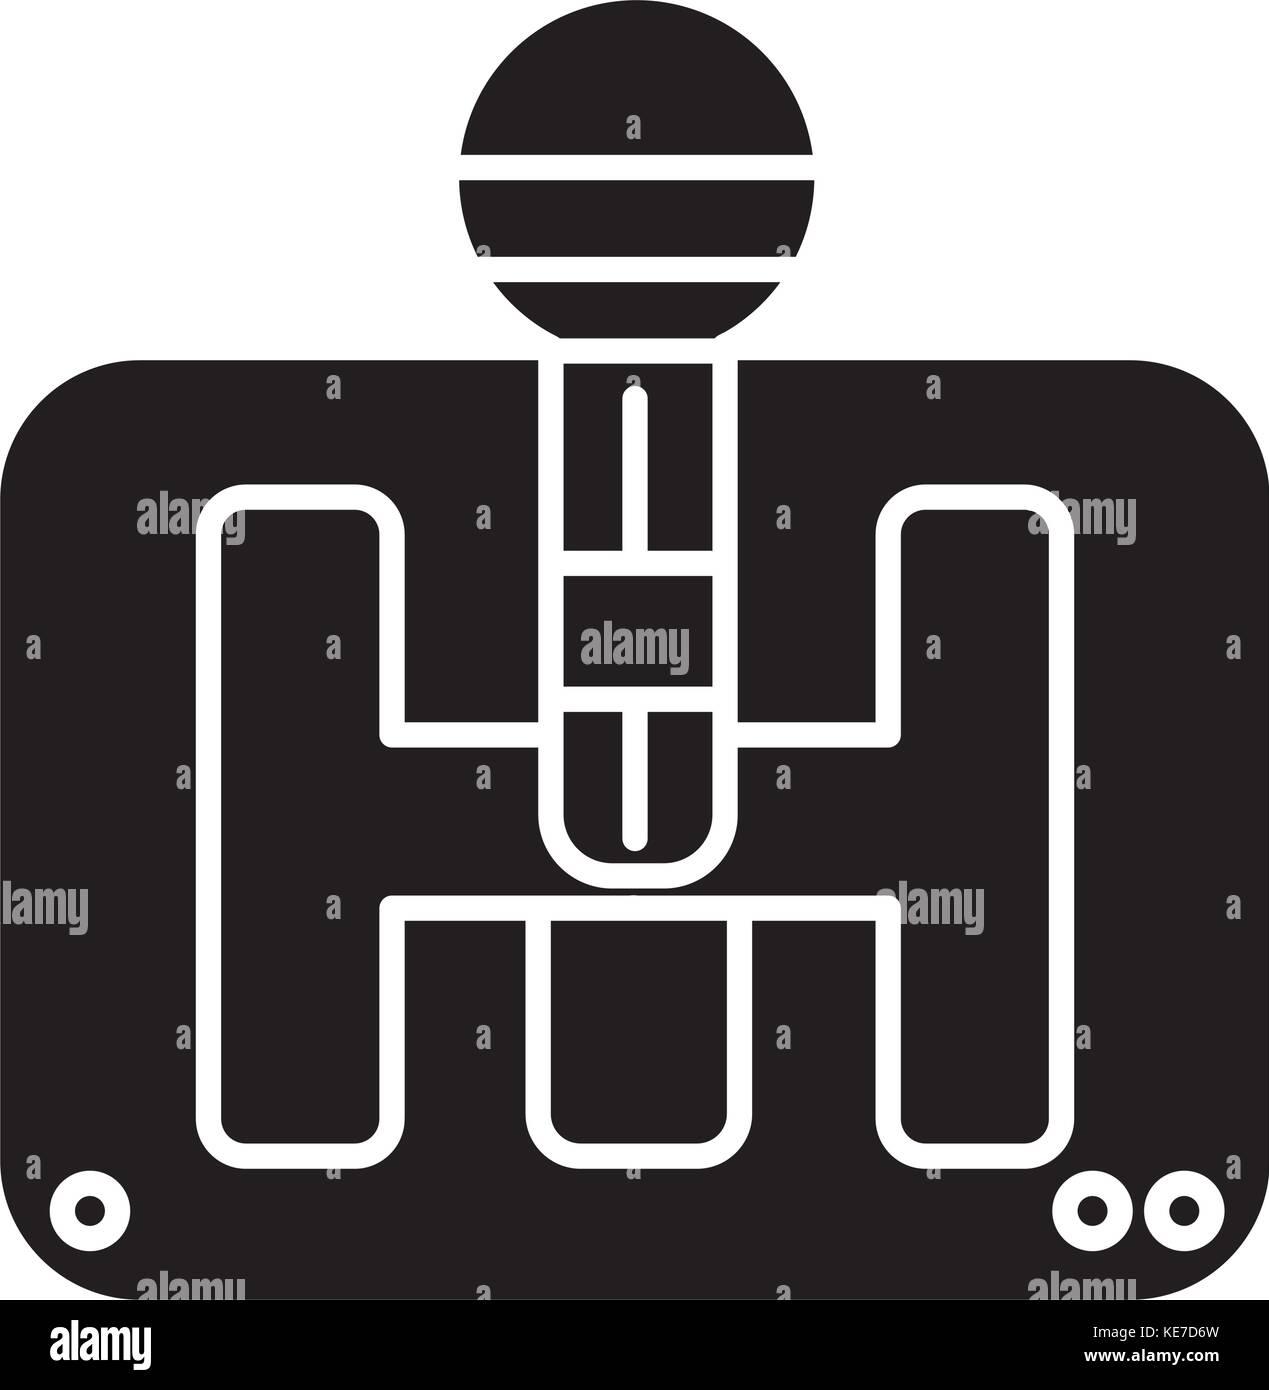 Ziemlich Batterieschema Symbol Bilder - Verdrahtungsideen - korsmi.info